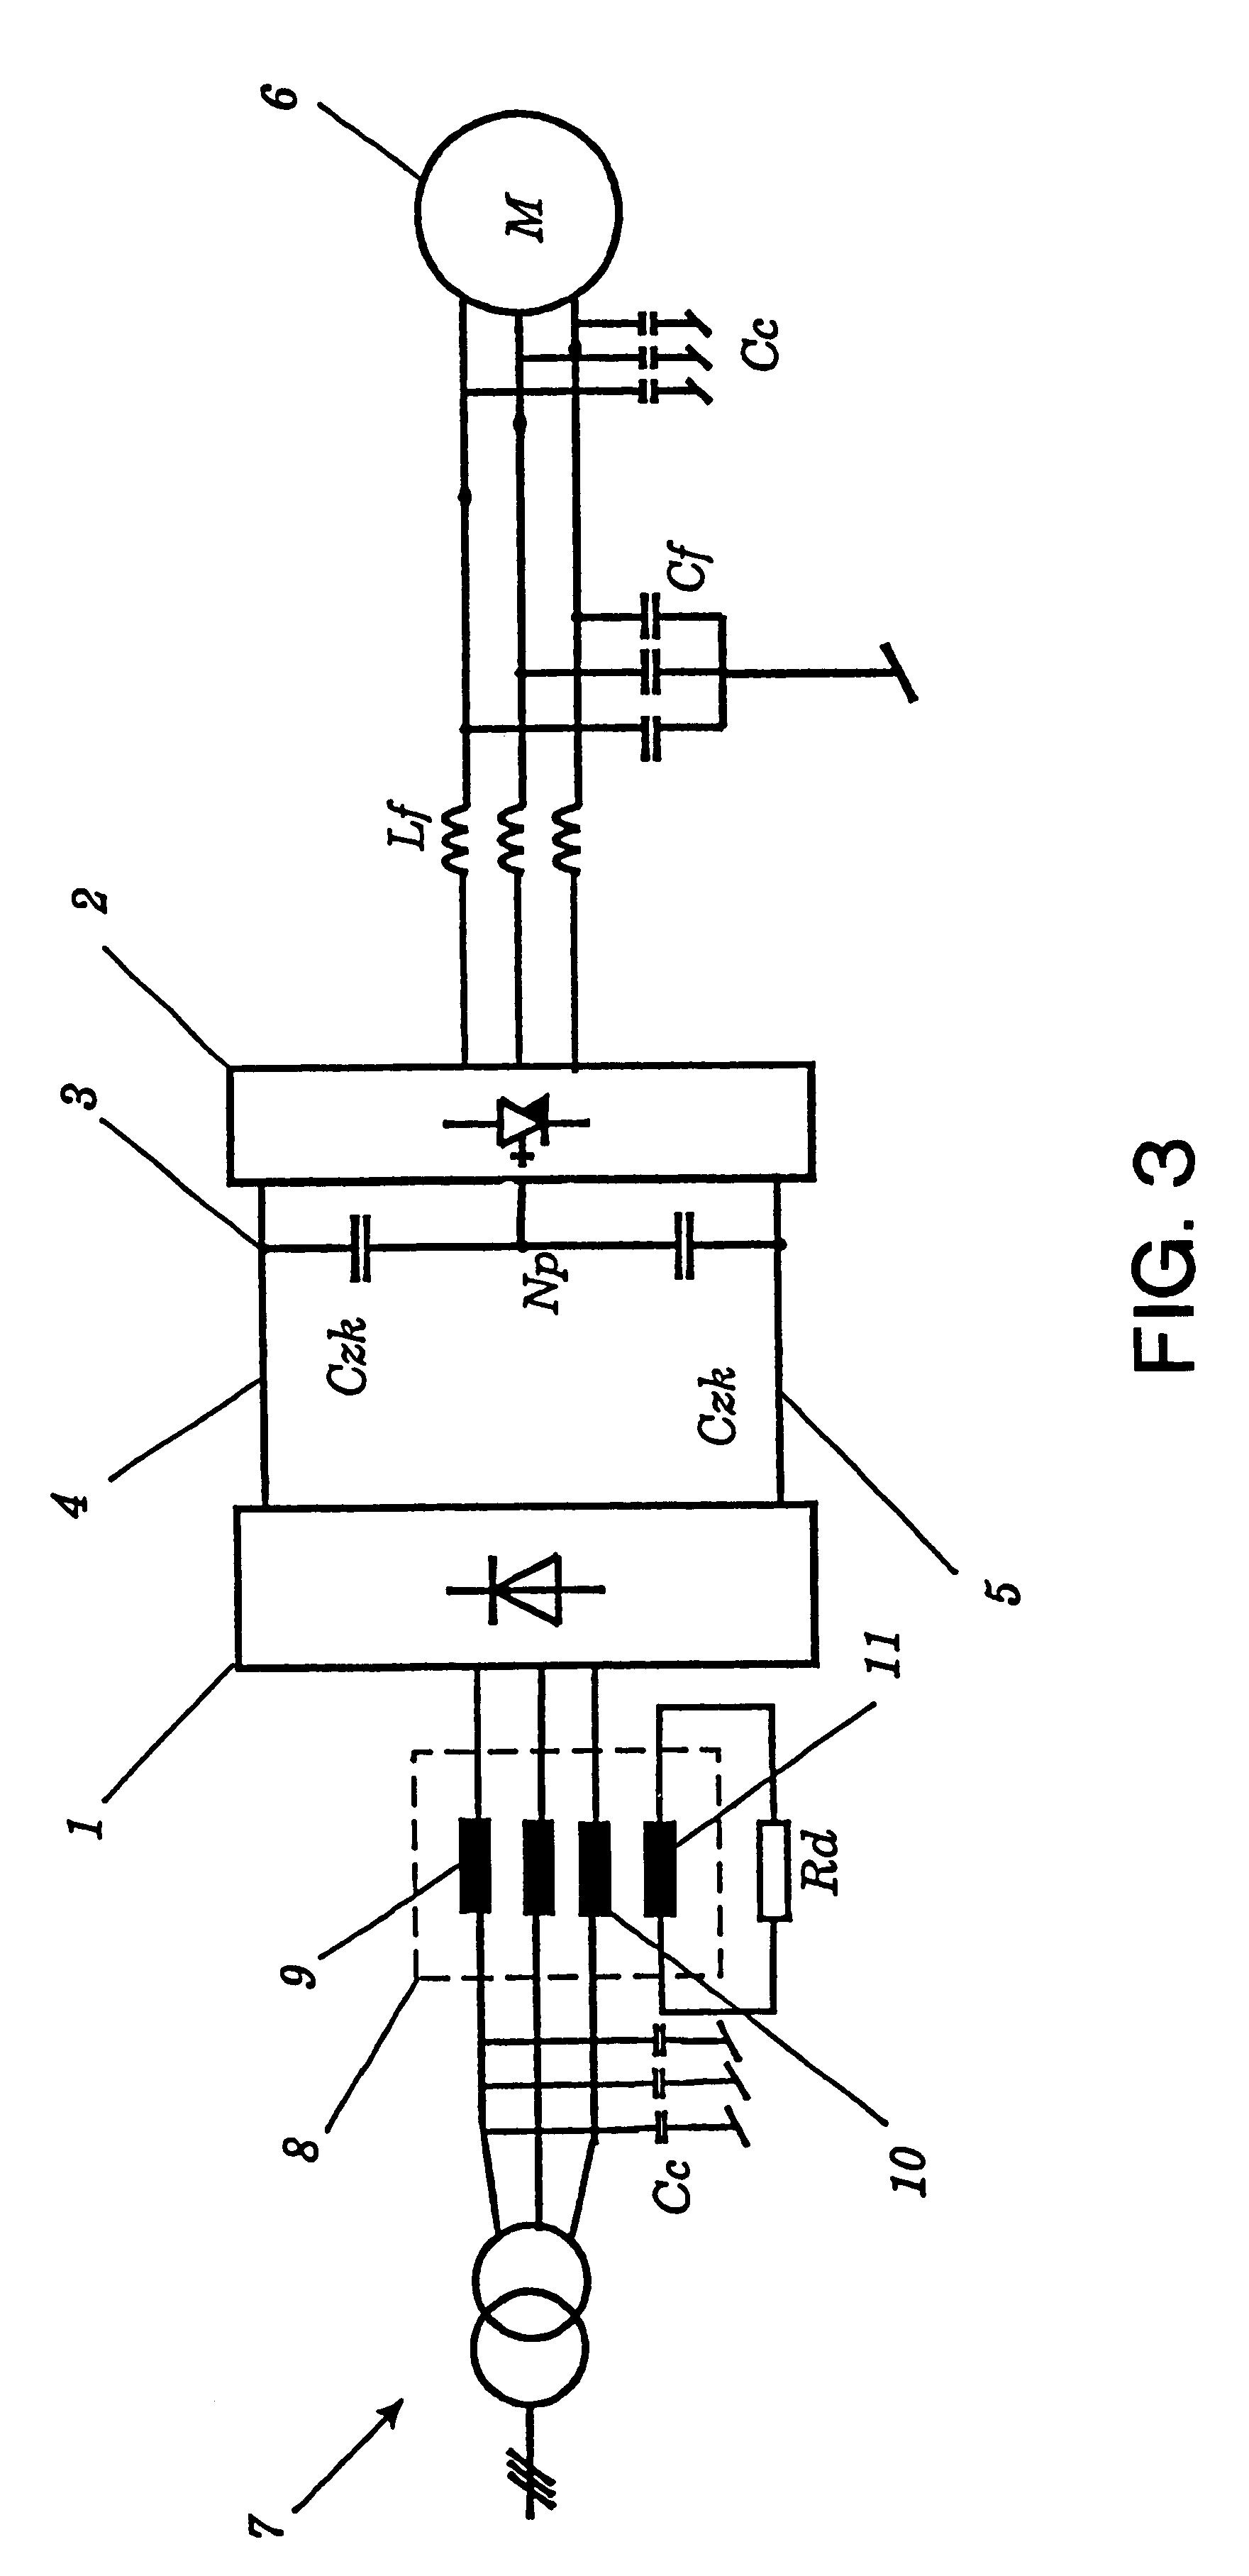 patent us6288915 - converter circuit arrangement having a dc intermediate circuit